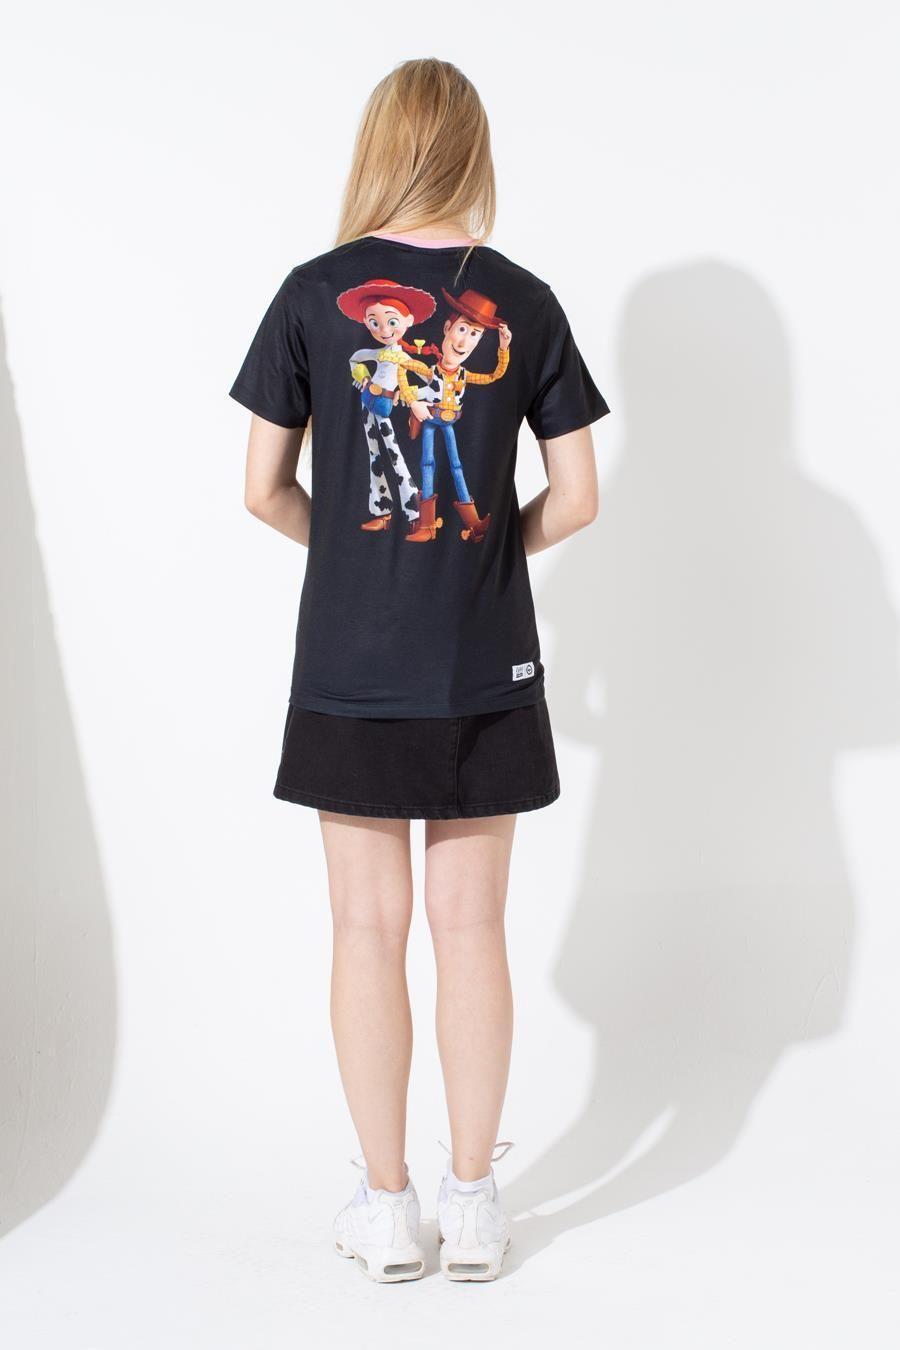 Hype Toy Story Black Western Ringer Kids T-Shirt